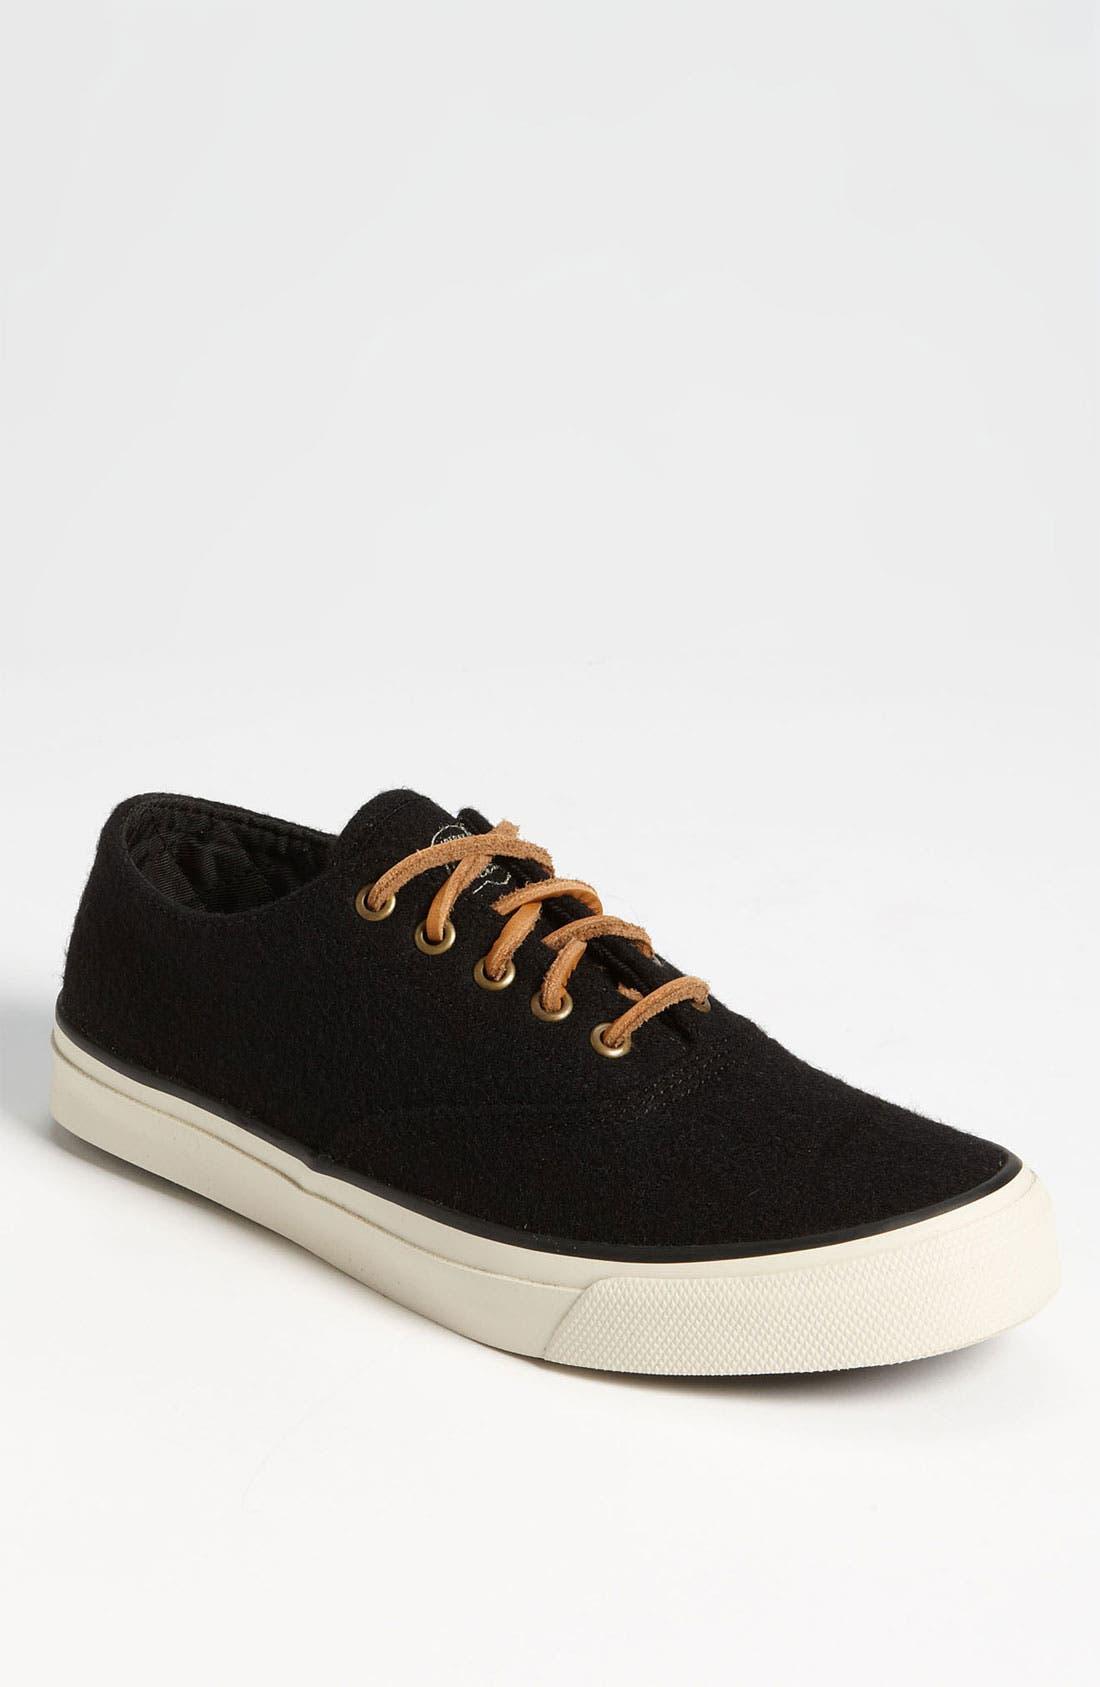 Alternate Image 1 Selected - Sperry Top-Sider® 'Fidelity - CVO' Wool Sneaker